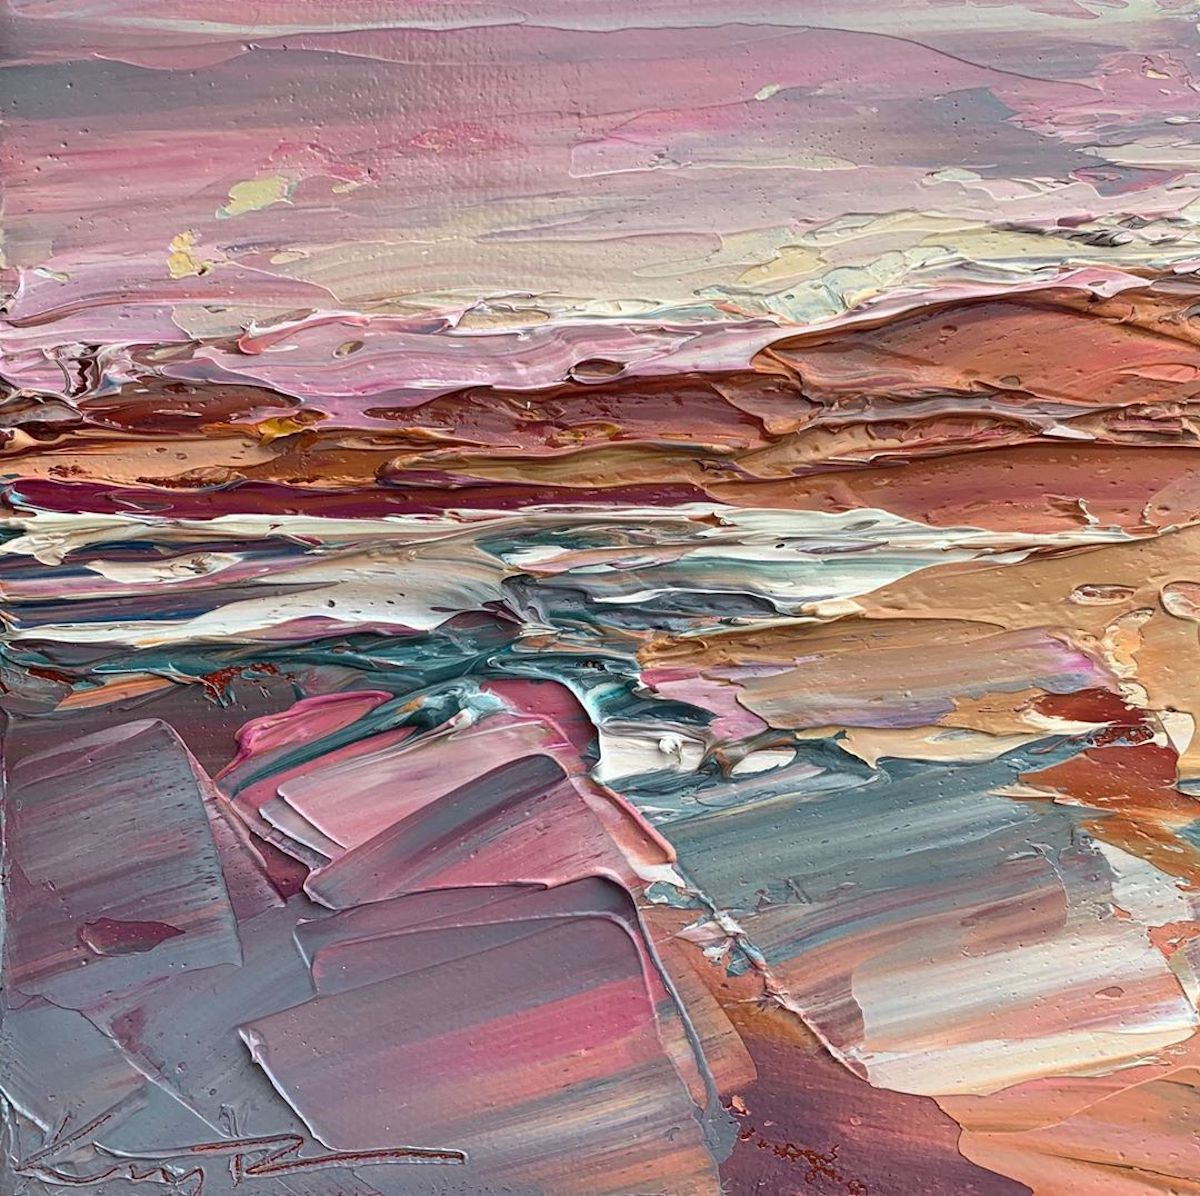 Palette Knife Painting by Krista Schumacher